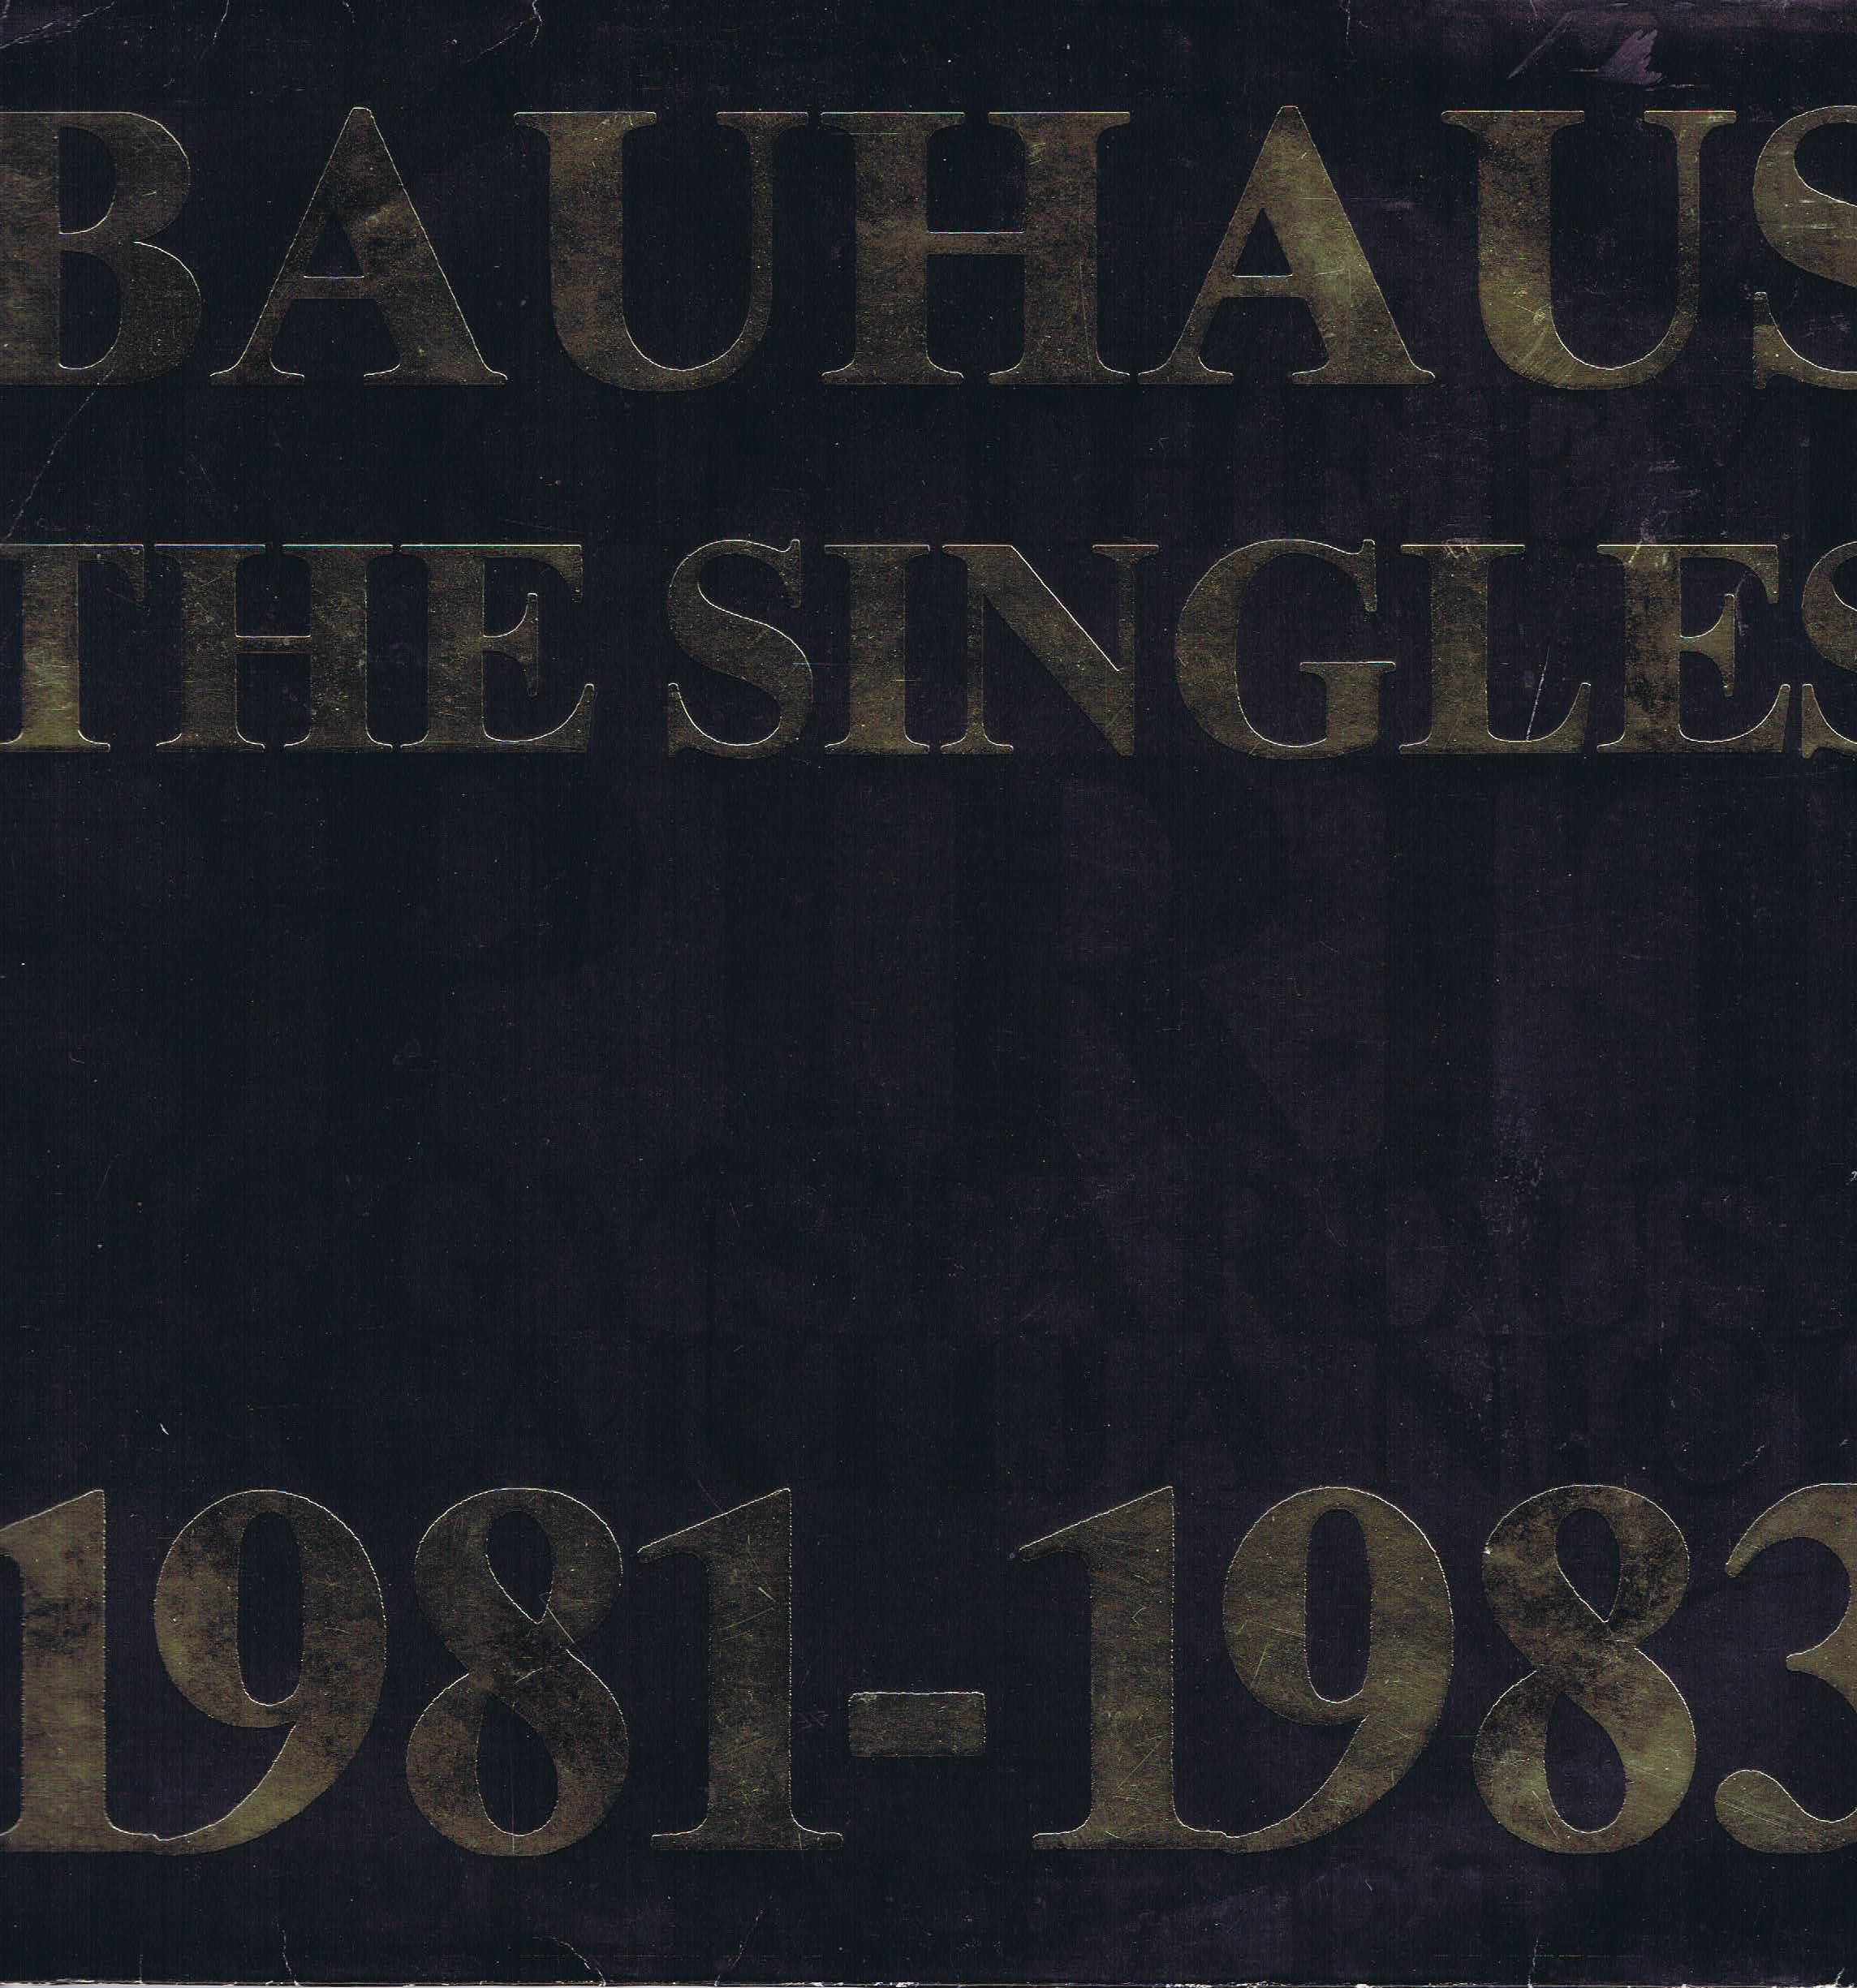 bauhaus the singles 1981 1983 lp vinyl record wax. Black Bedroom Furniture Sets. Home Design Ideas